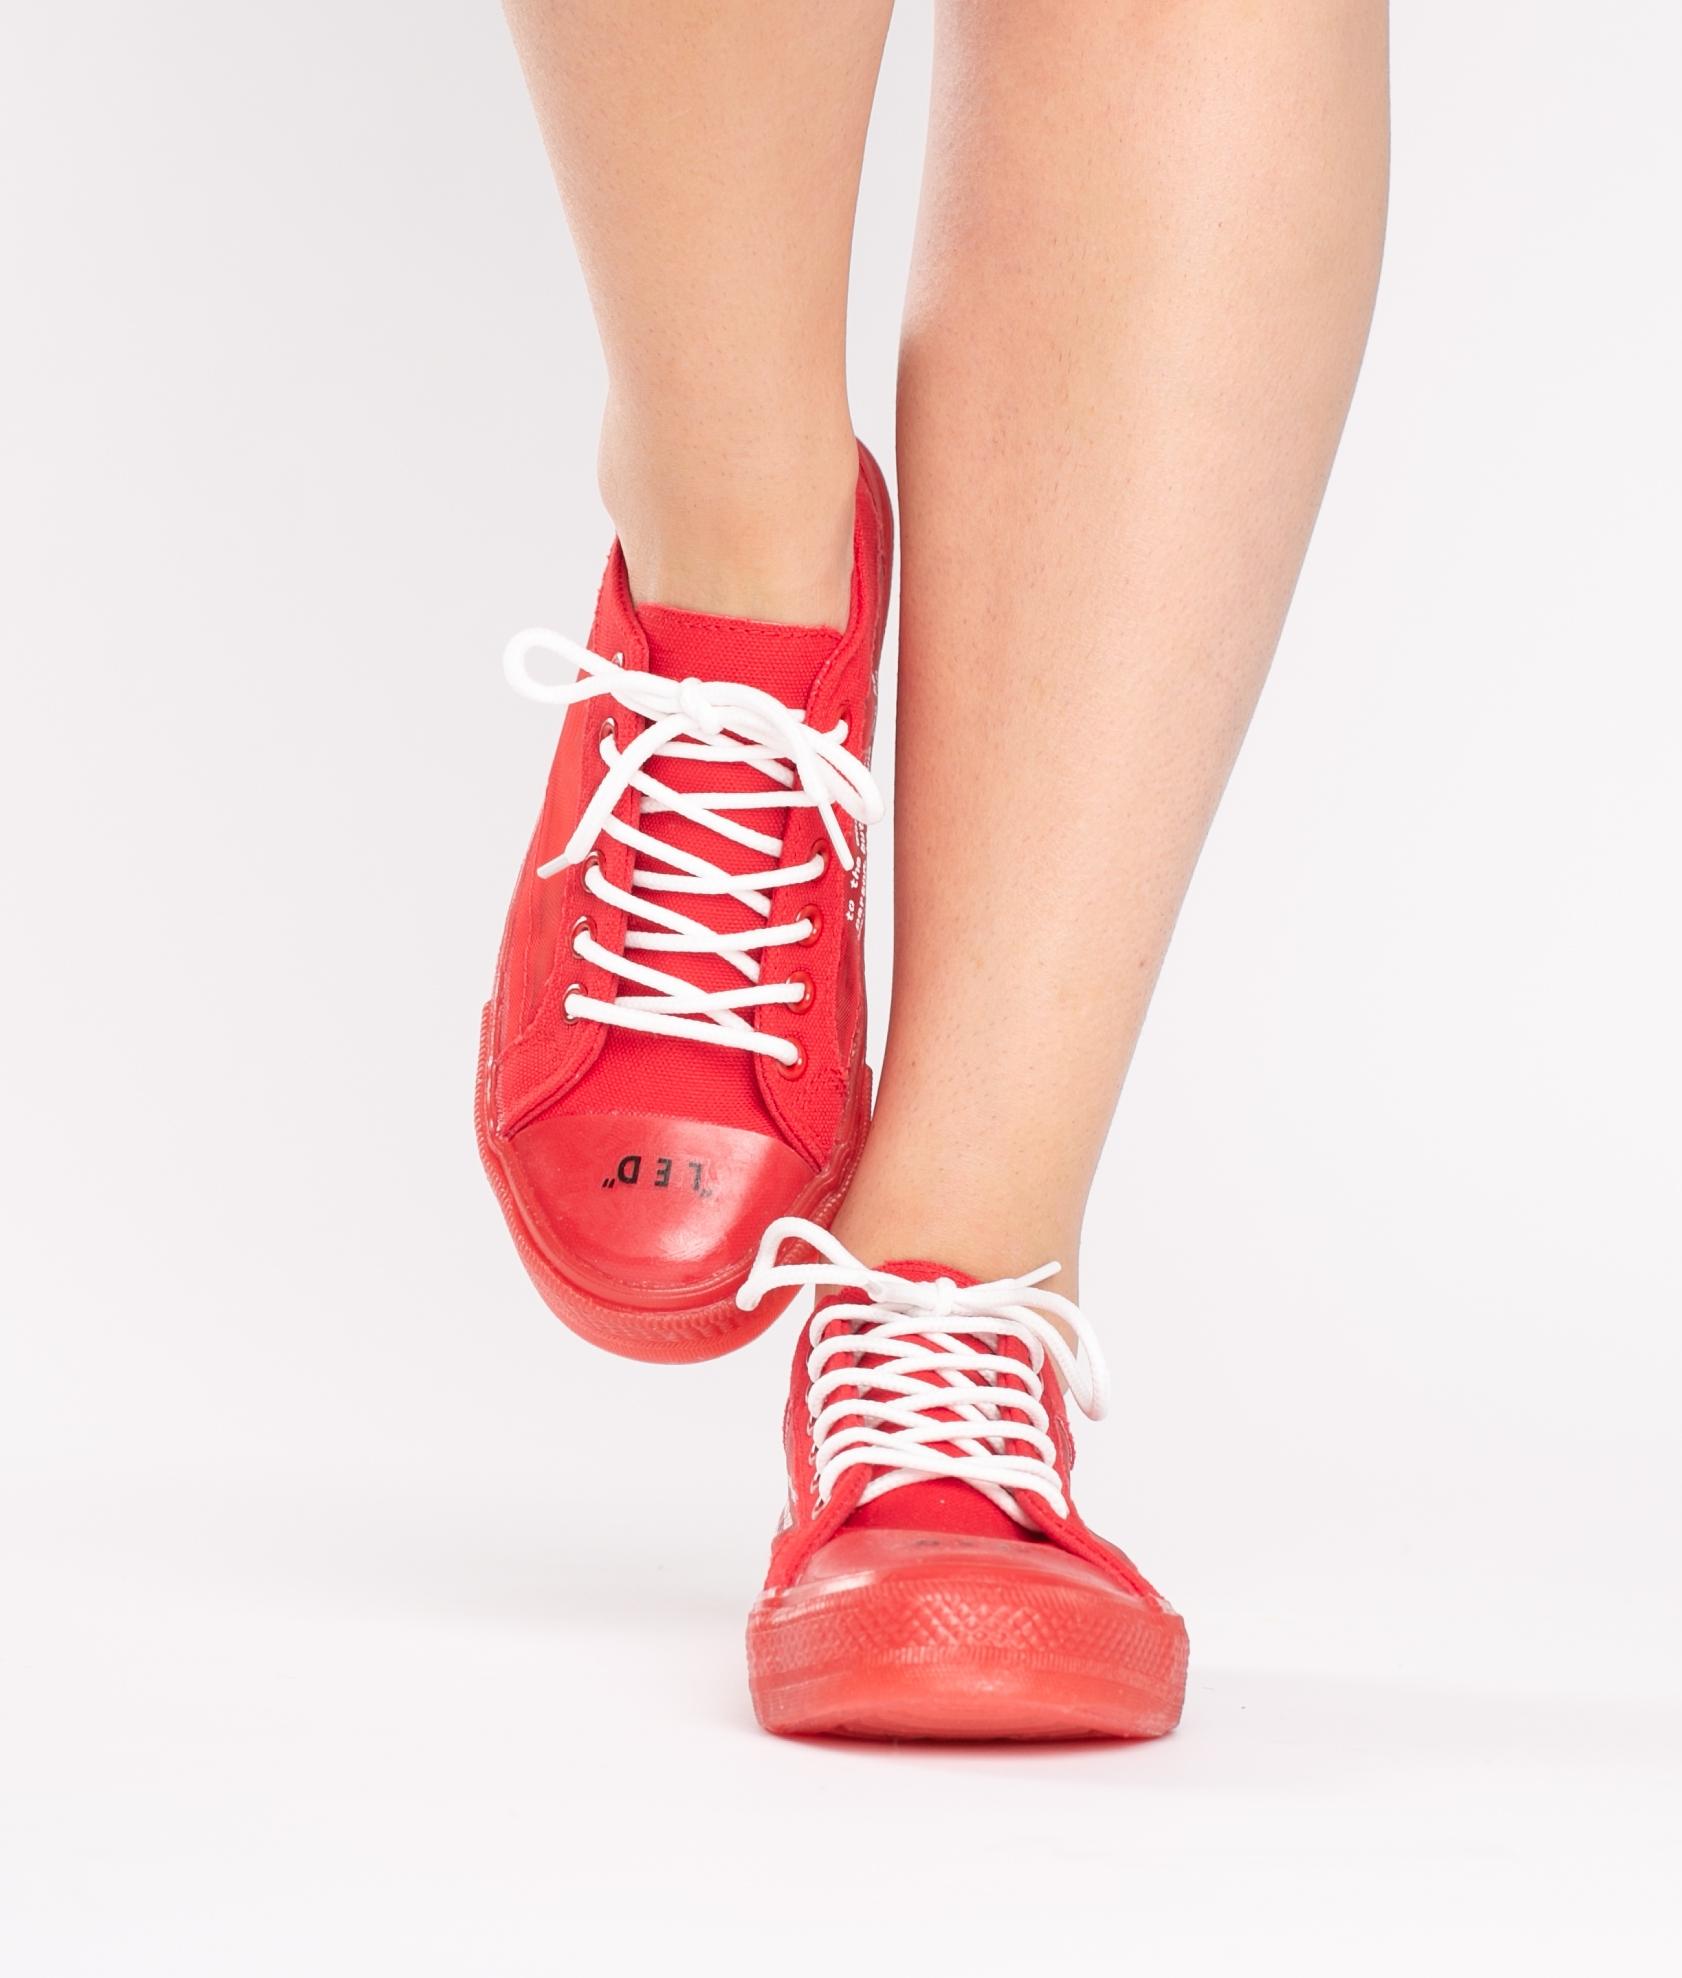 Sneakers Led - Preto